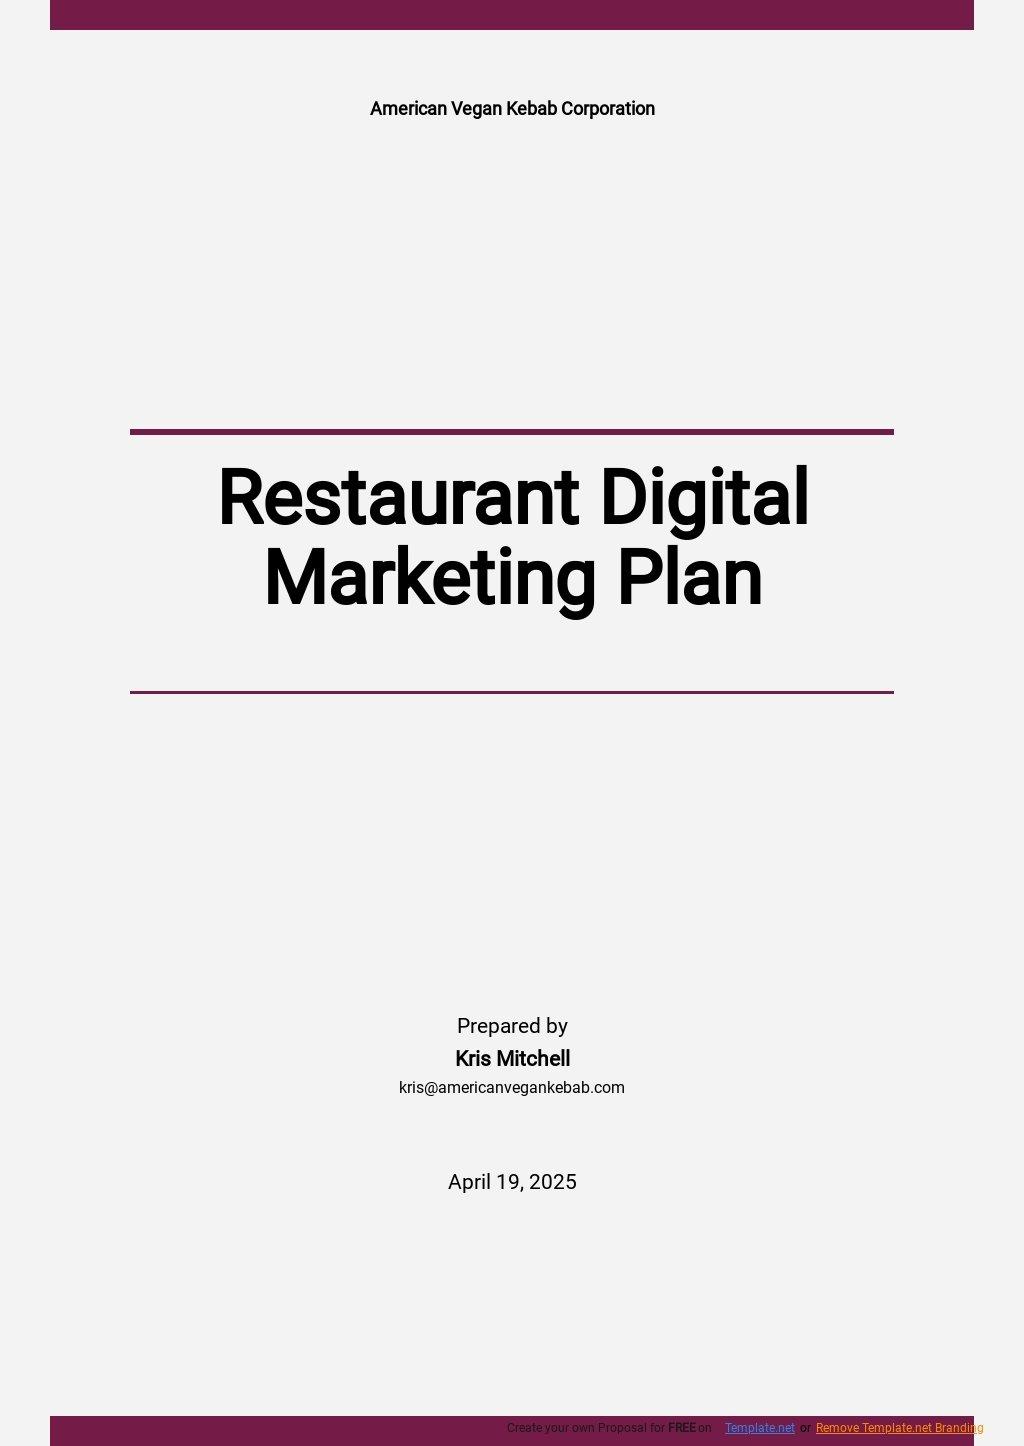 Restaurant Digital Marketing Plan Template.jpe